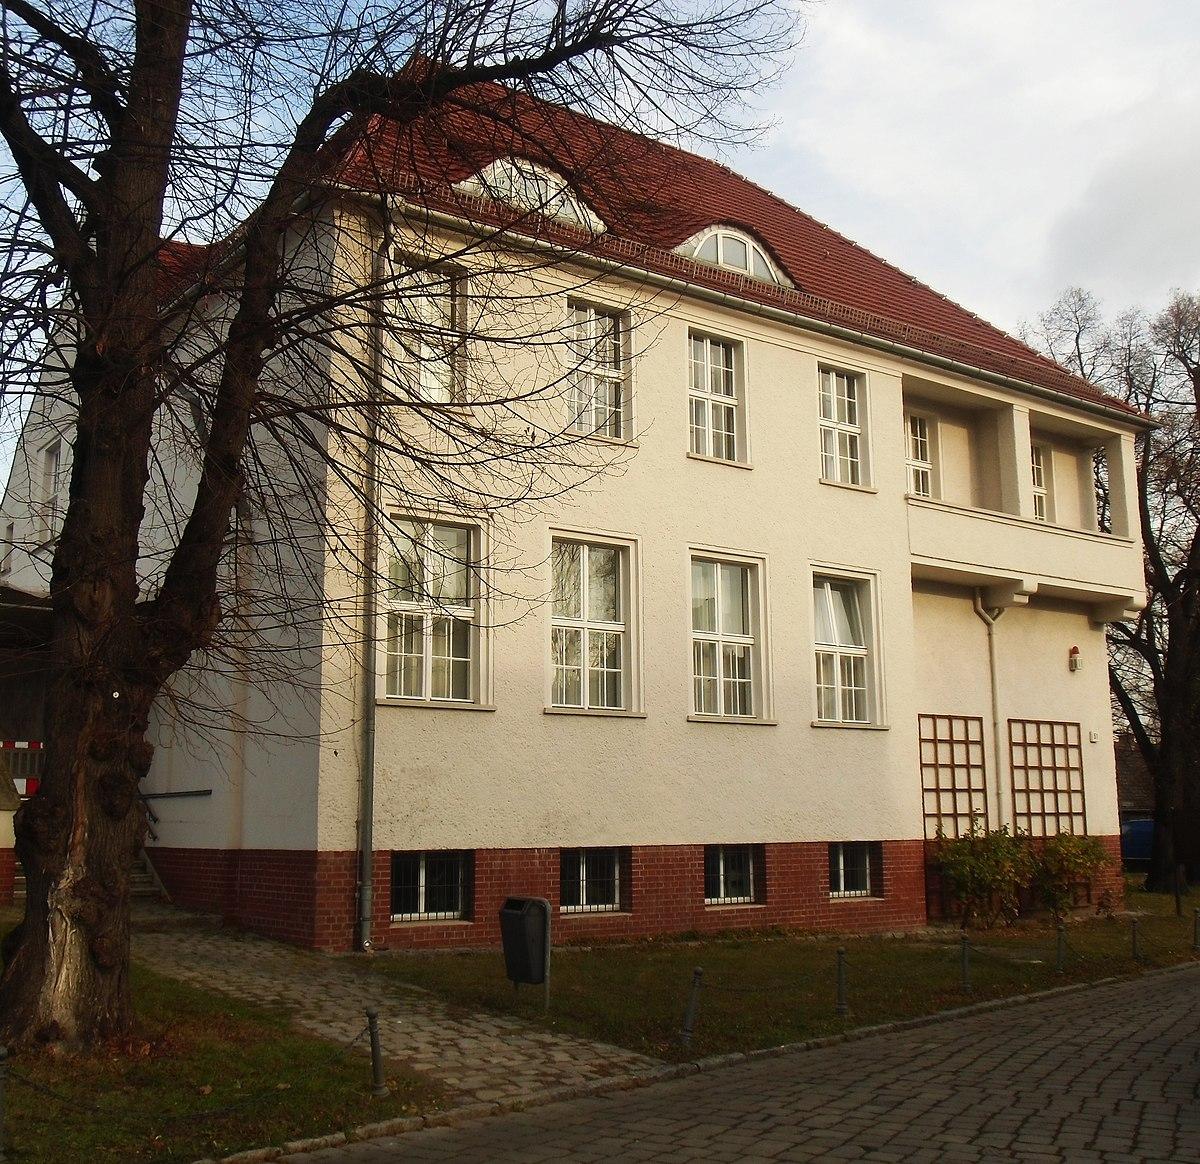 marzahn dzielnica berlina wikipedia wolna encyklopedia. Black Bedroom Furniture Sets. Home Design Ideas